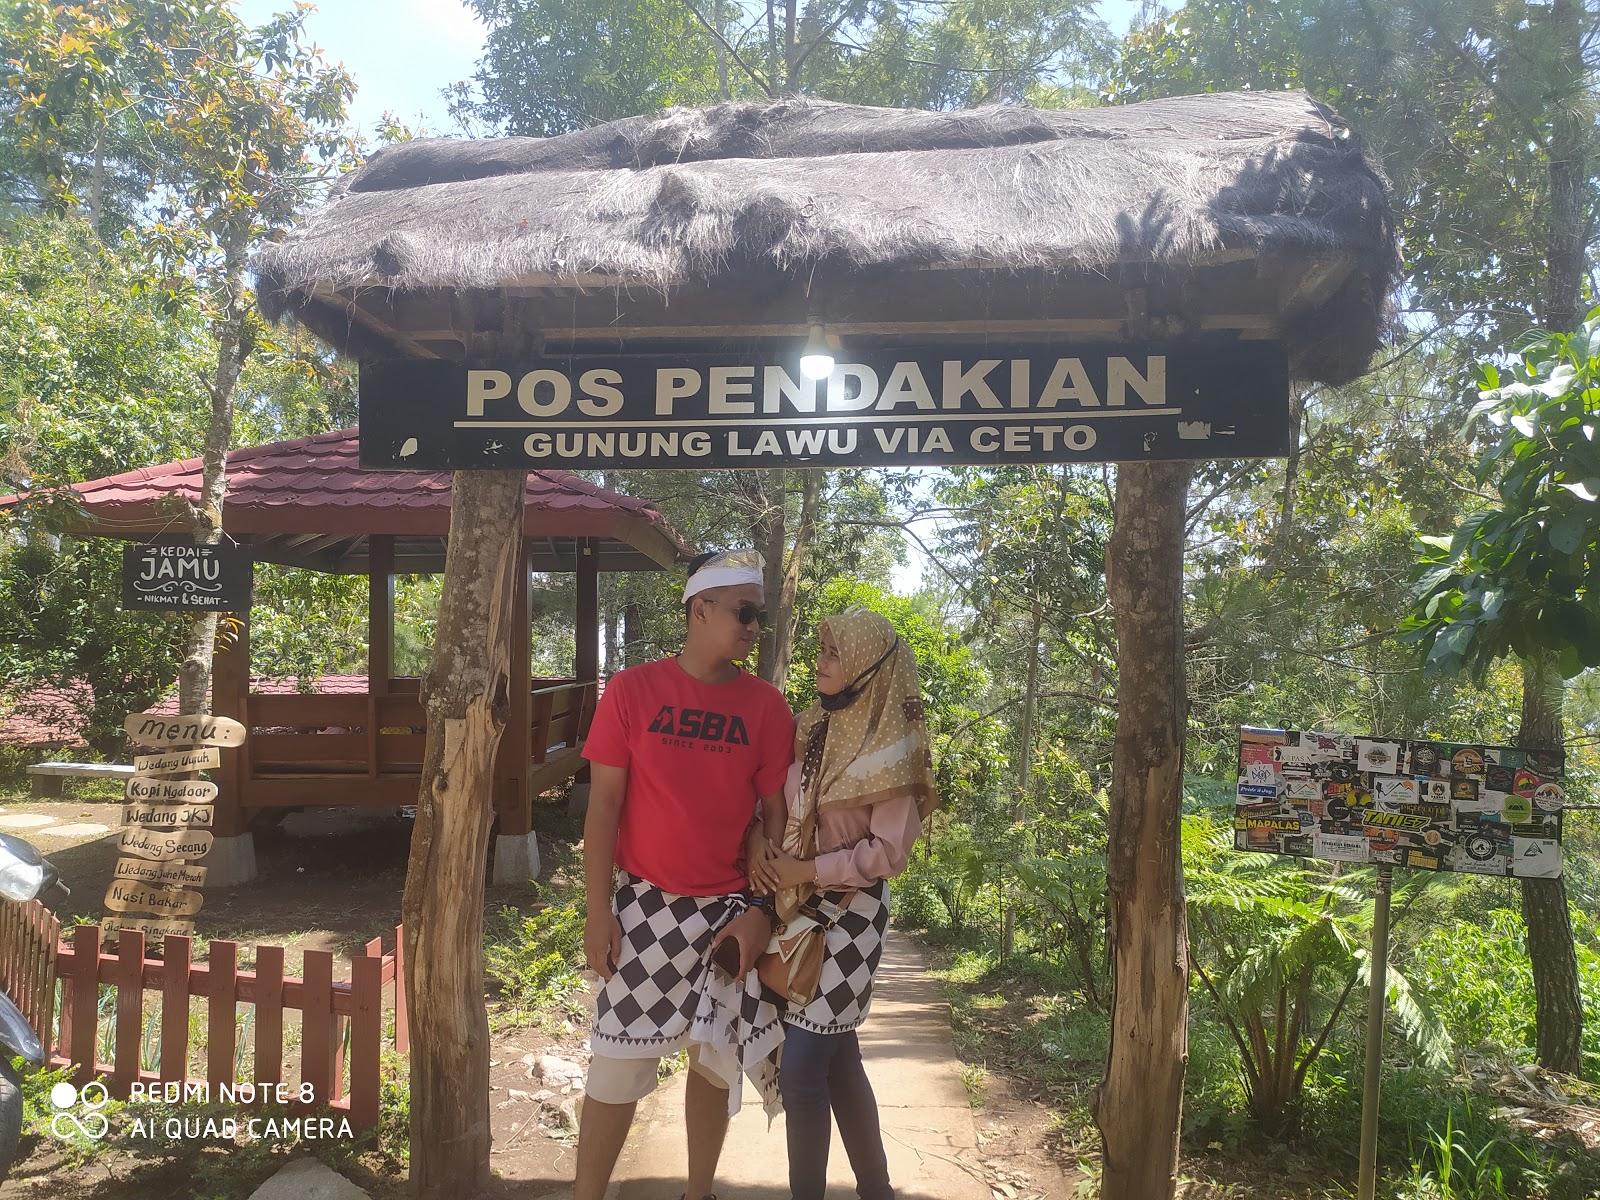 Pos Pendakian Gunung Lawu via Candi Ceto